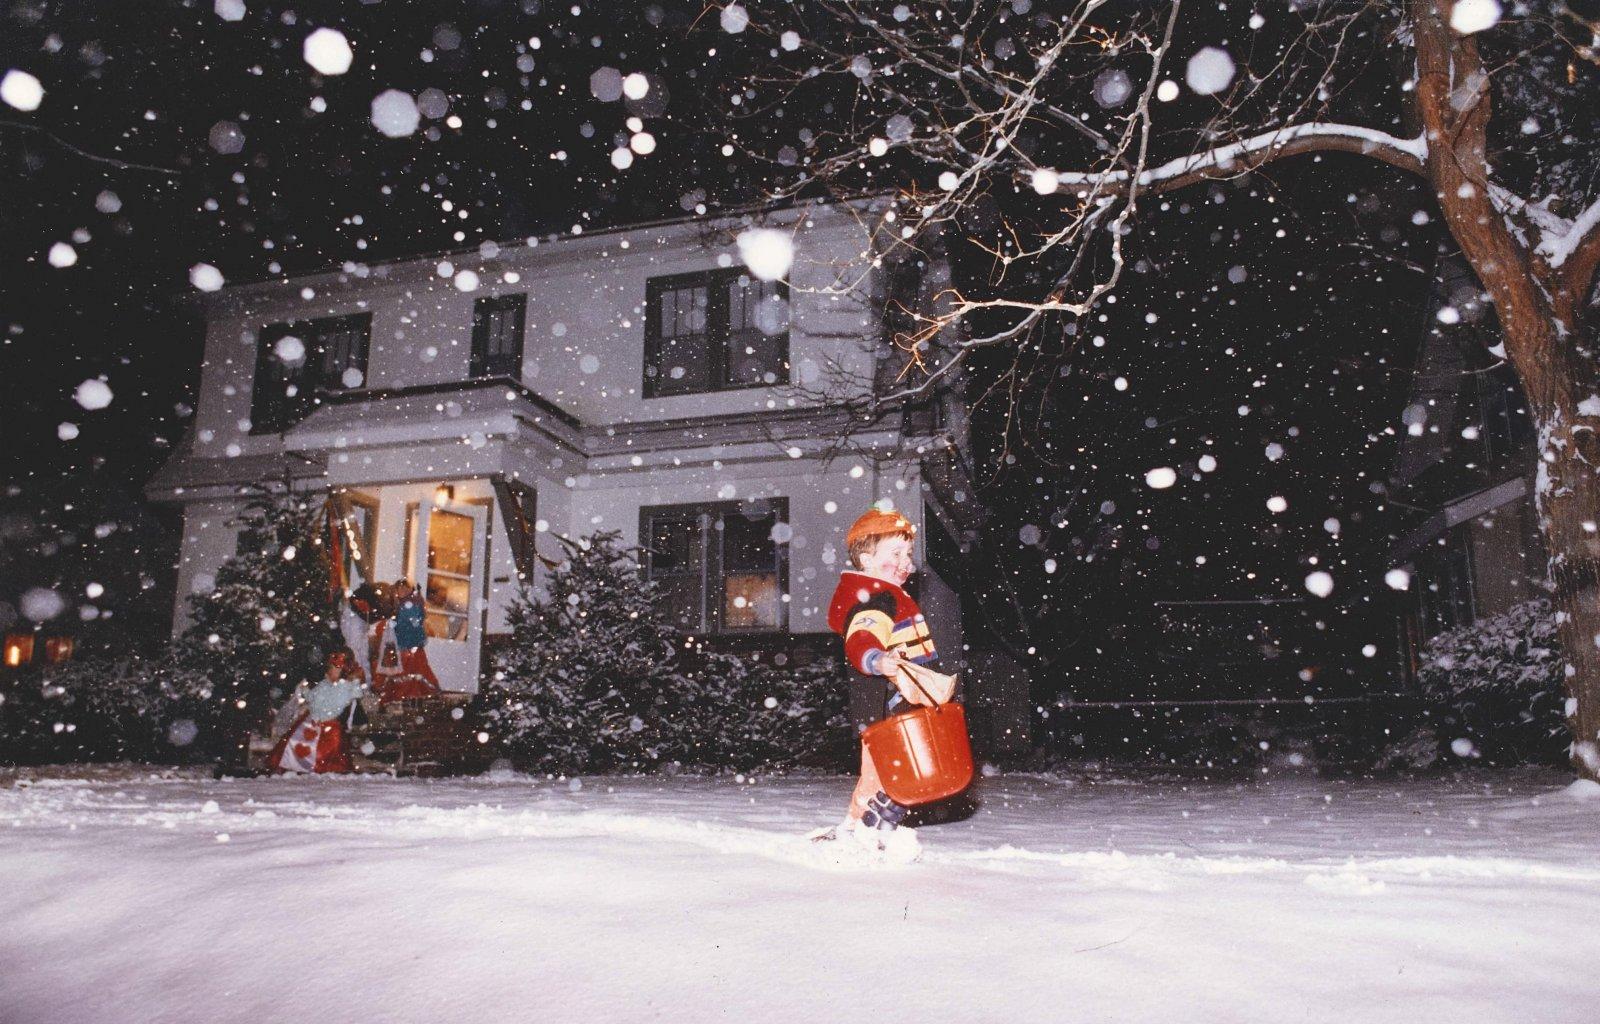 trick-or-treat-snow-e1477856358277.jpg